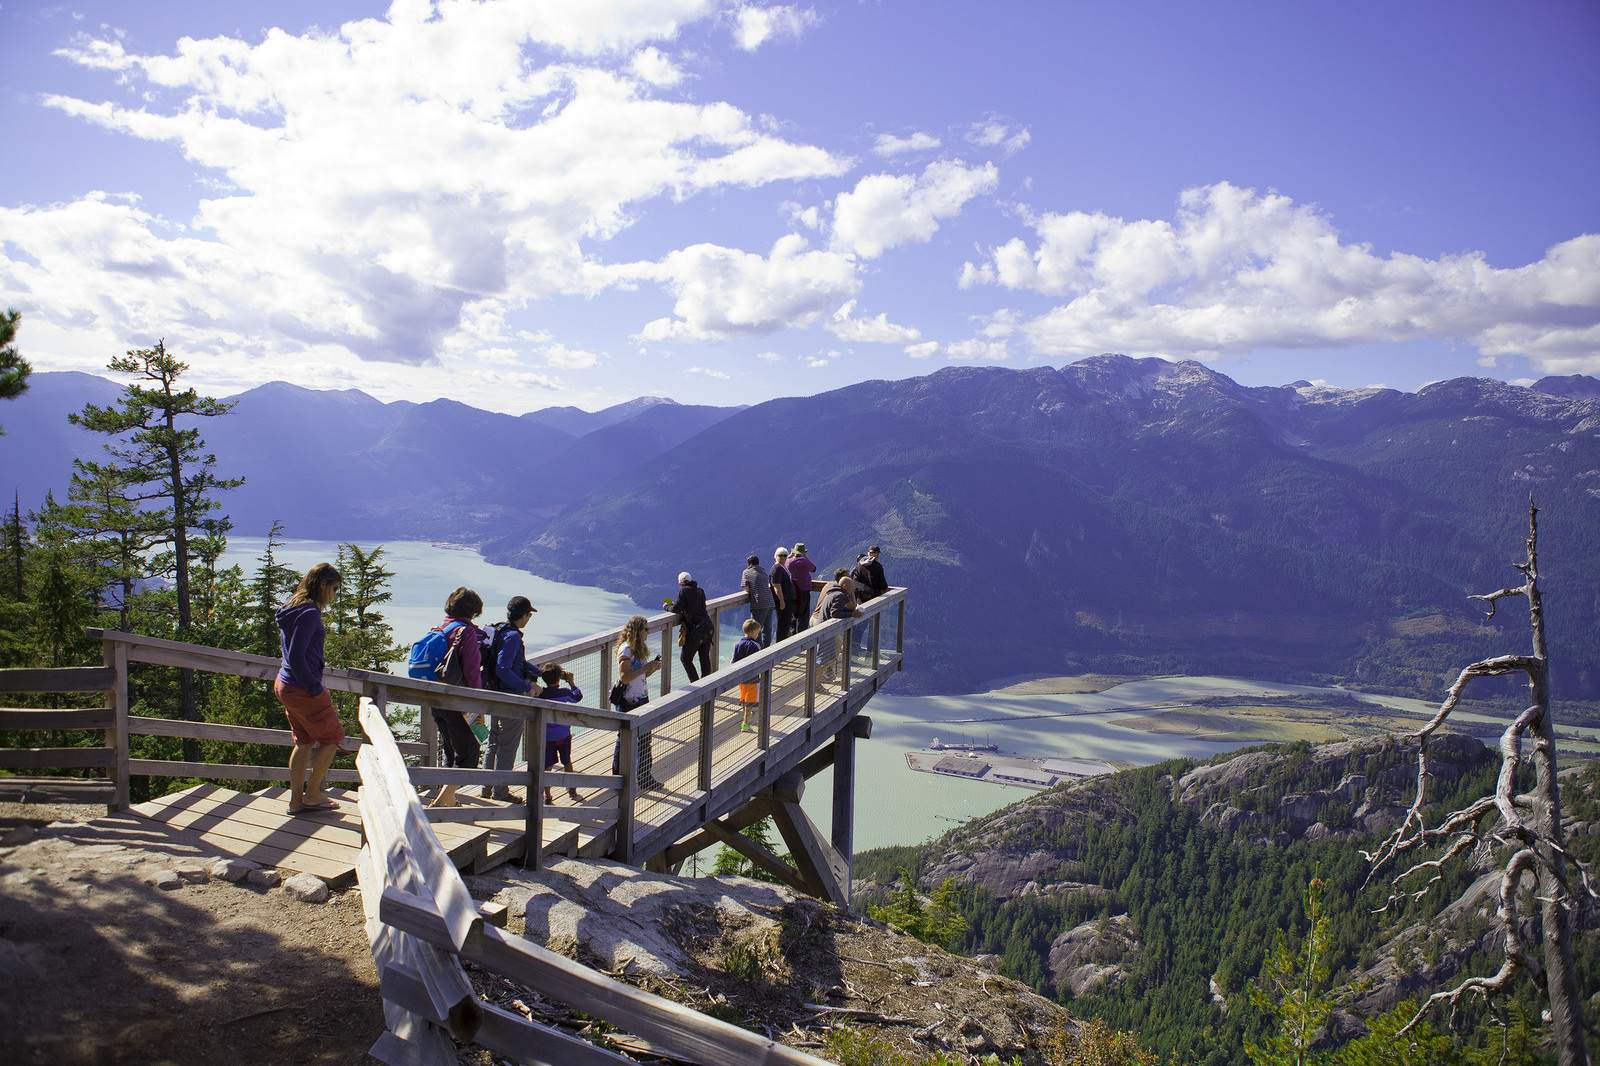 sea to sky gondola7 Sea to Sky Gondola Halfway Between Vancouver and Whistler